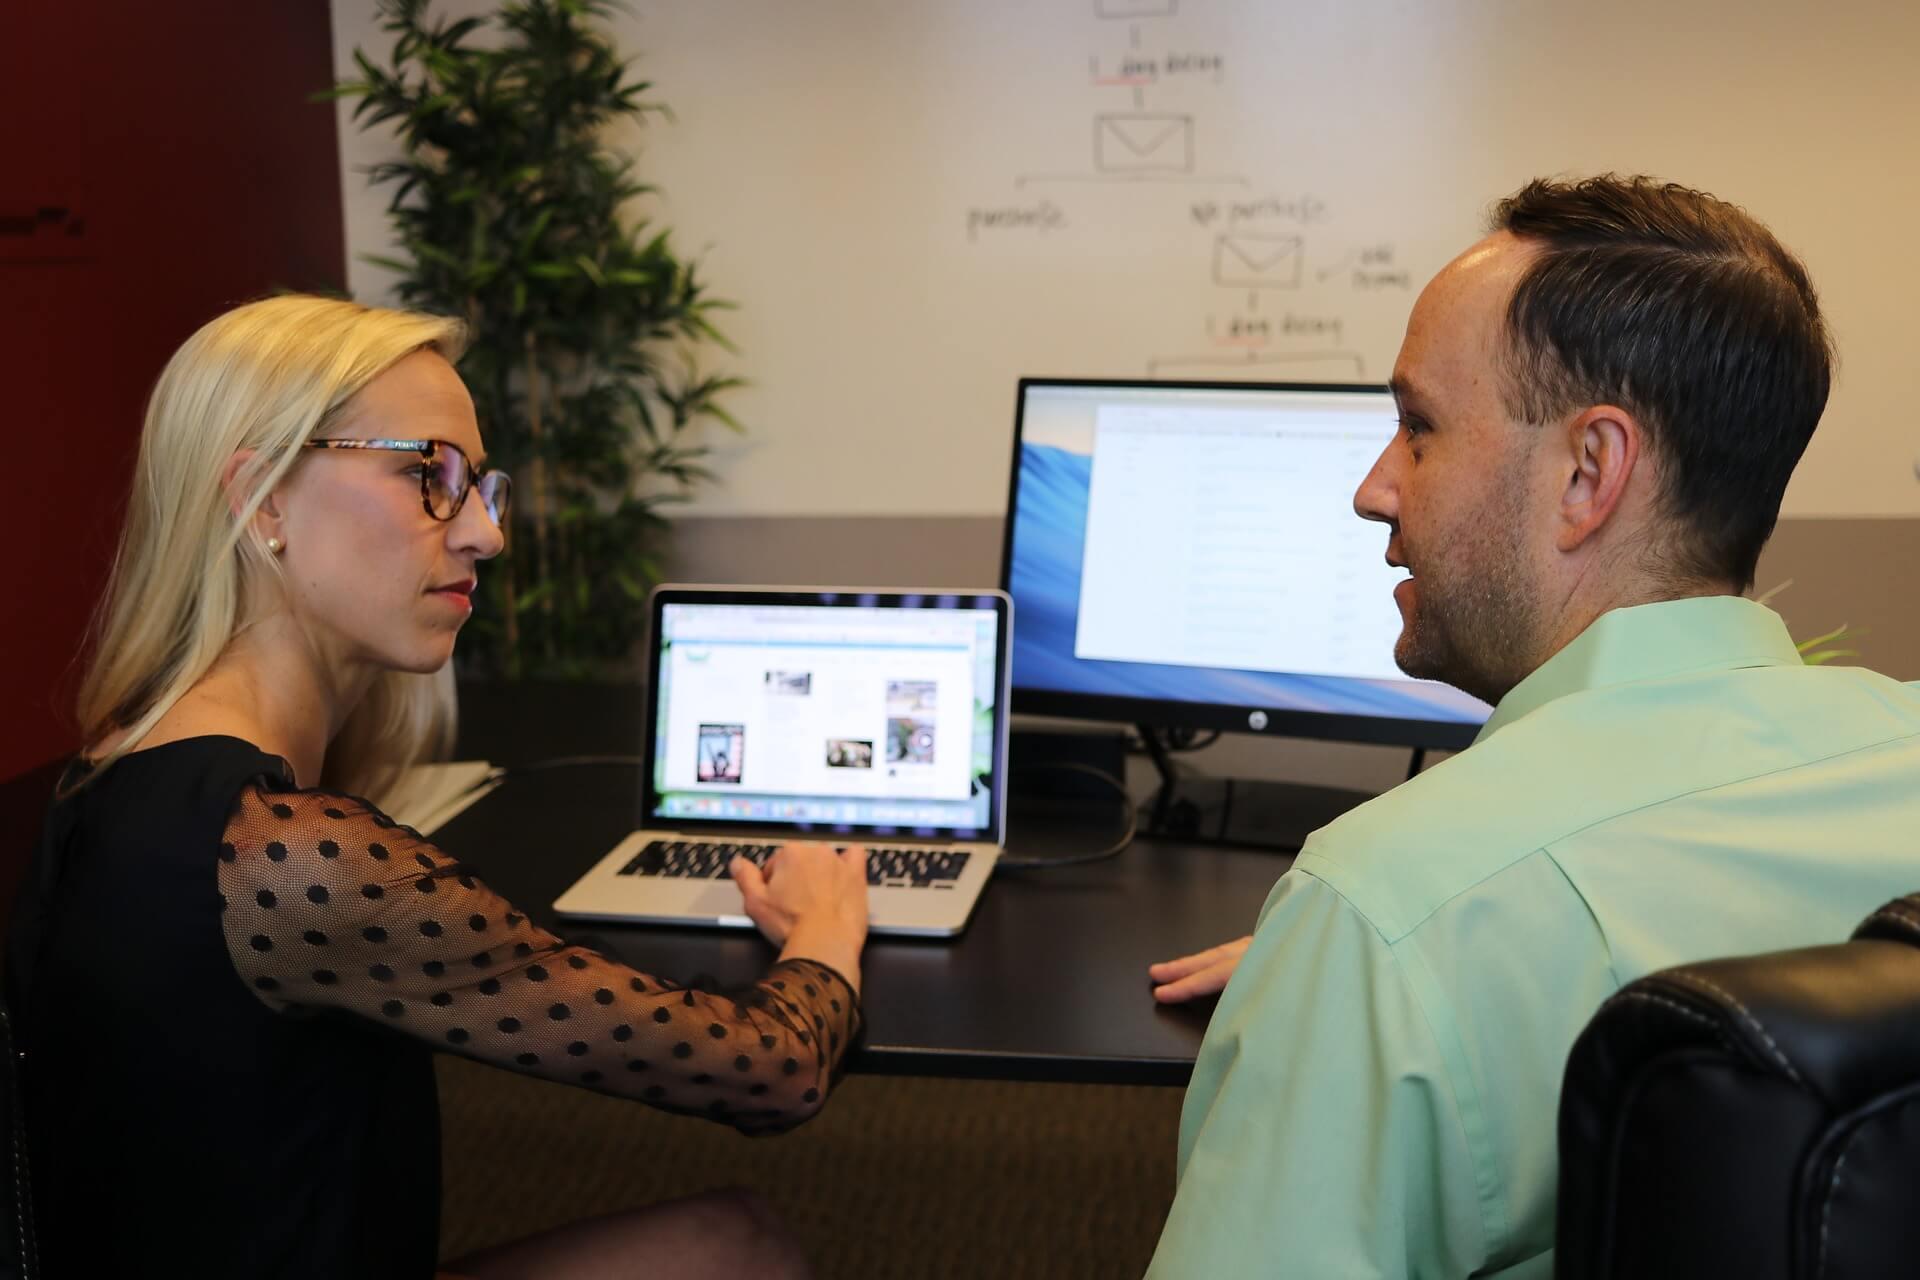 travailler ensemble techno pedagogie apprentissage